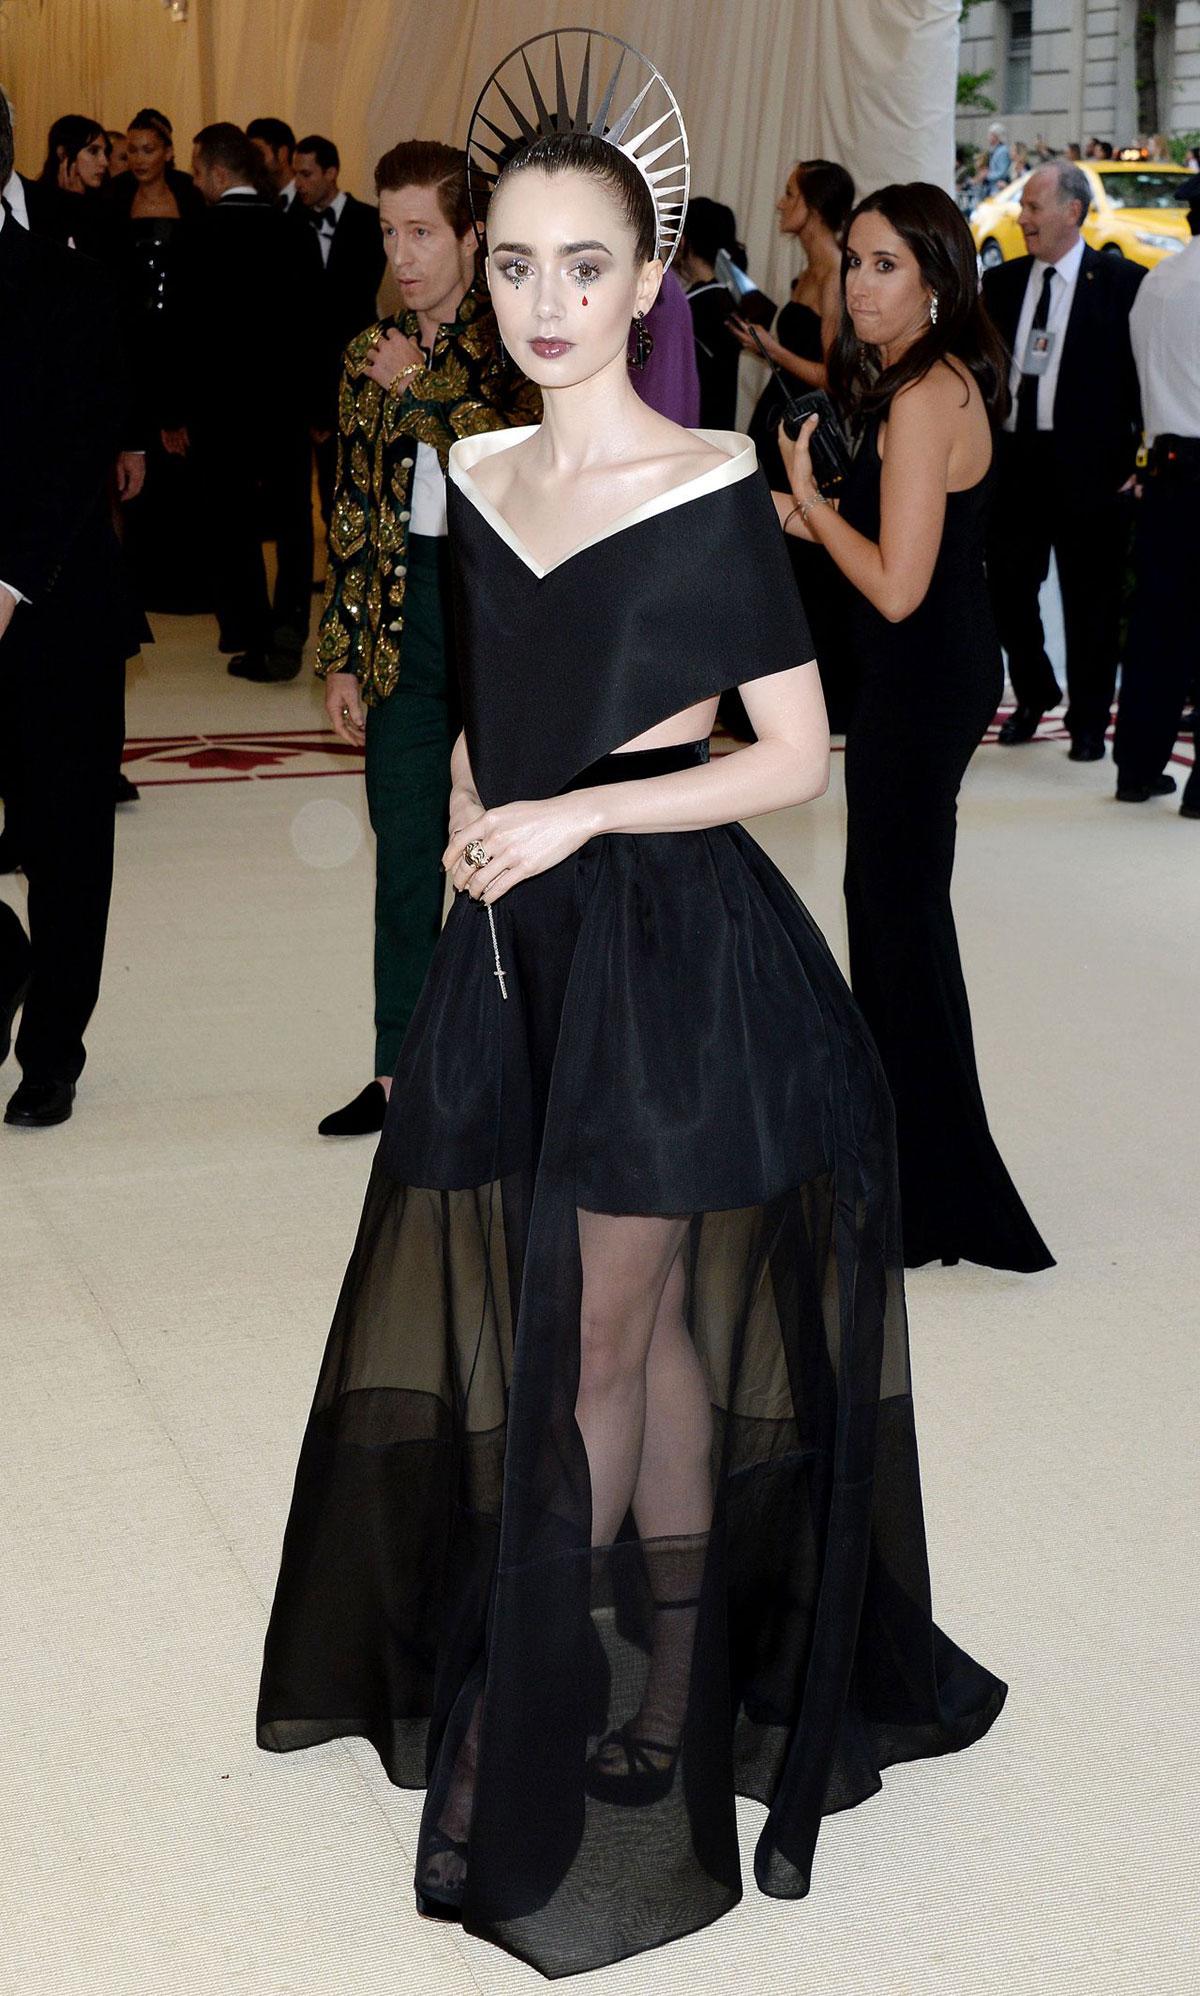 Celebrity Fashion U2013 Lily Collins At MET Gala 2018 - JustFabzz